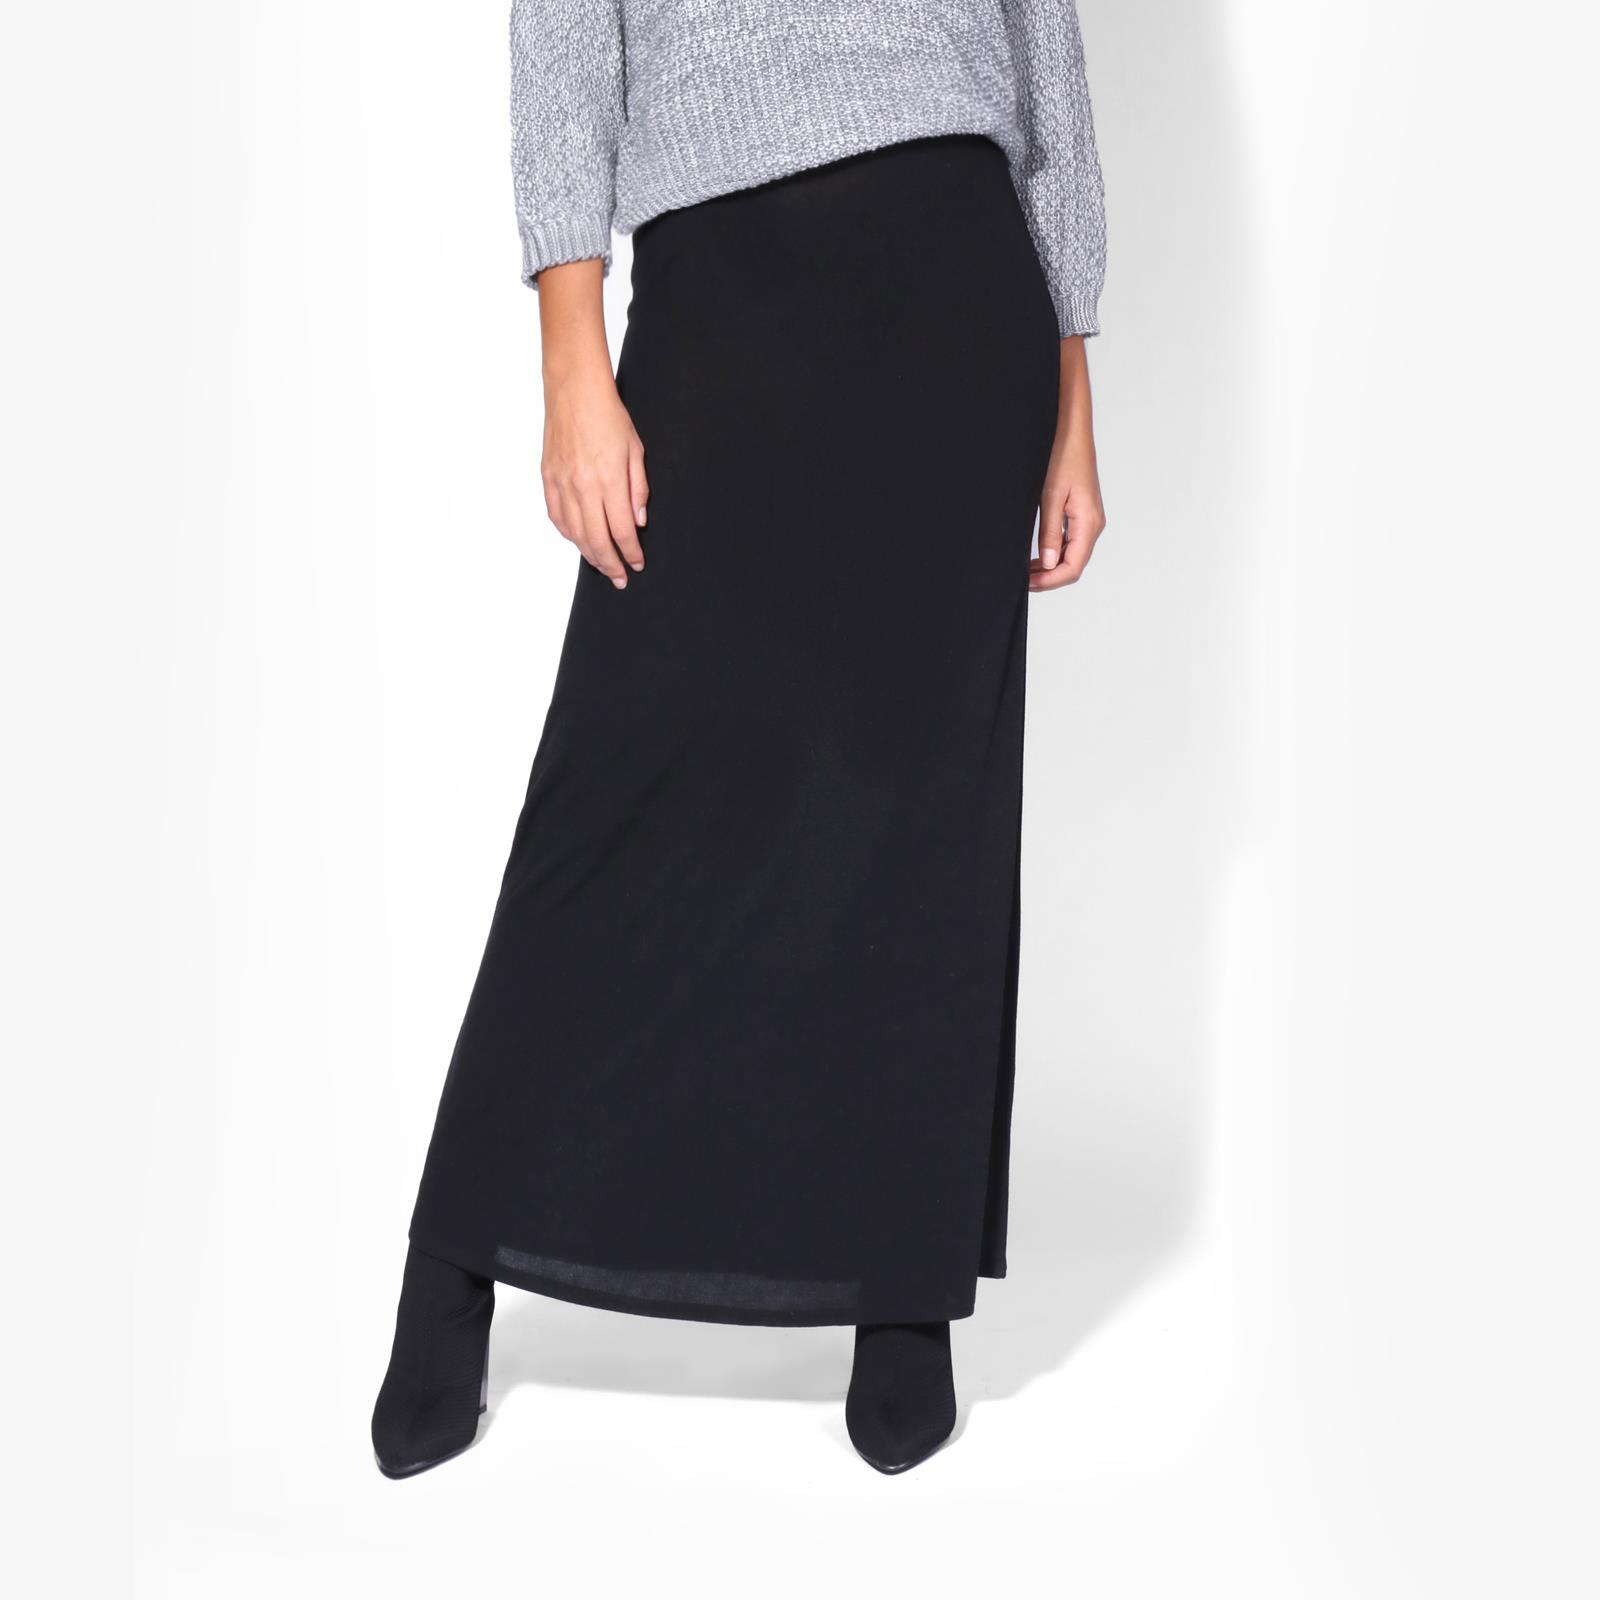 Womens-Ladies-Maxi-Skirt-High-Waist-A-Line-Long-Knit-Stretch-Bodycon-Casual-Boho thumbnail 4